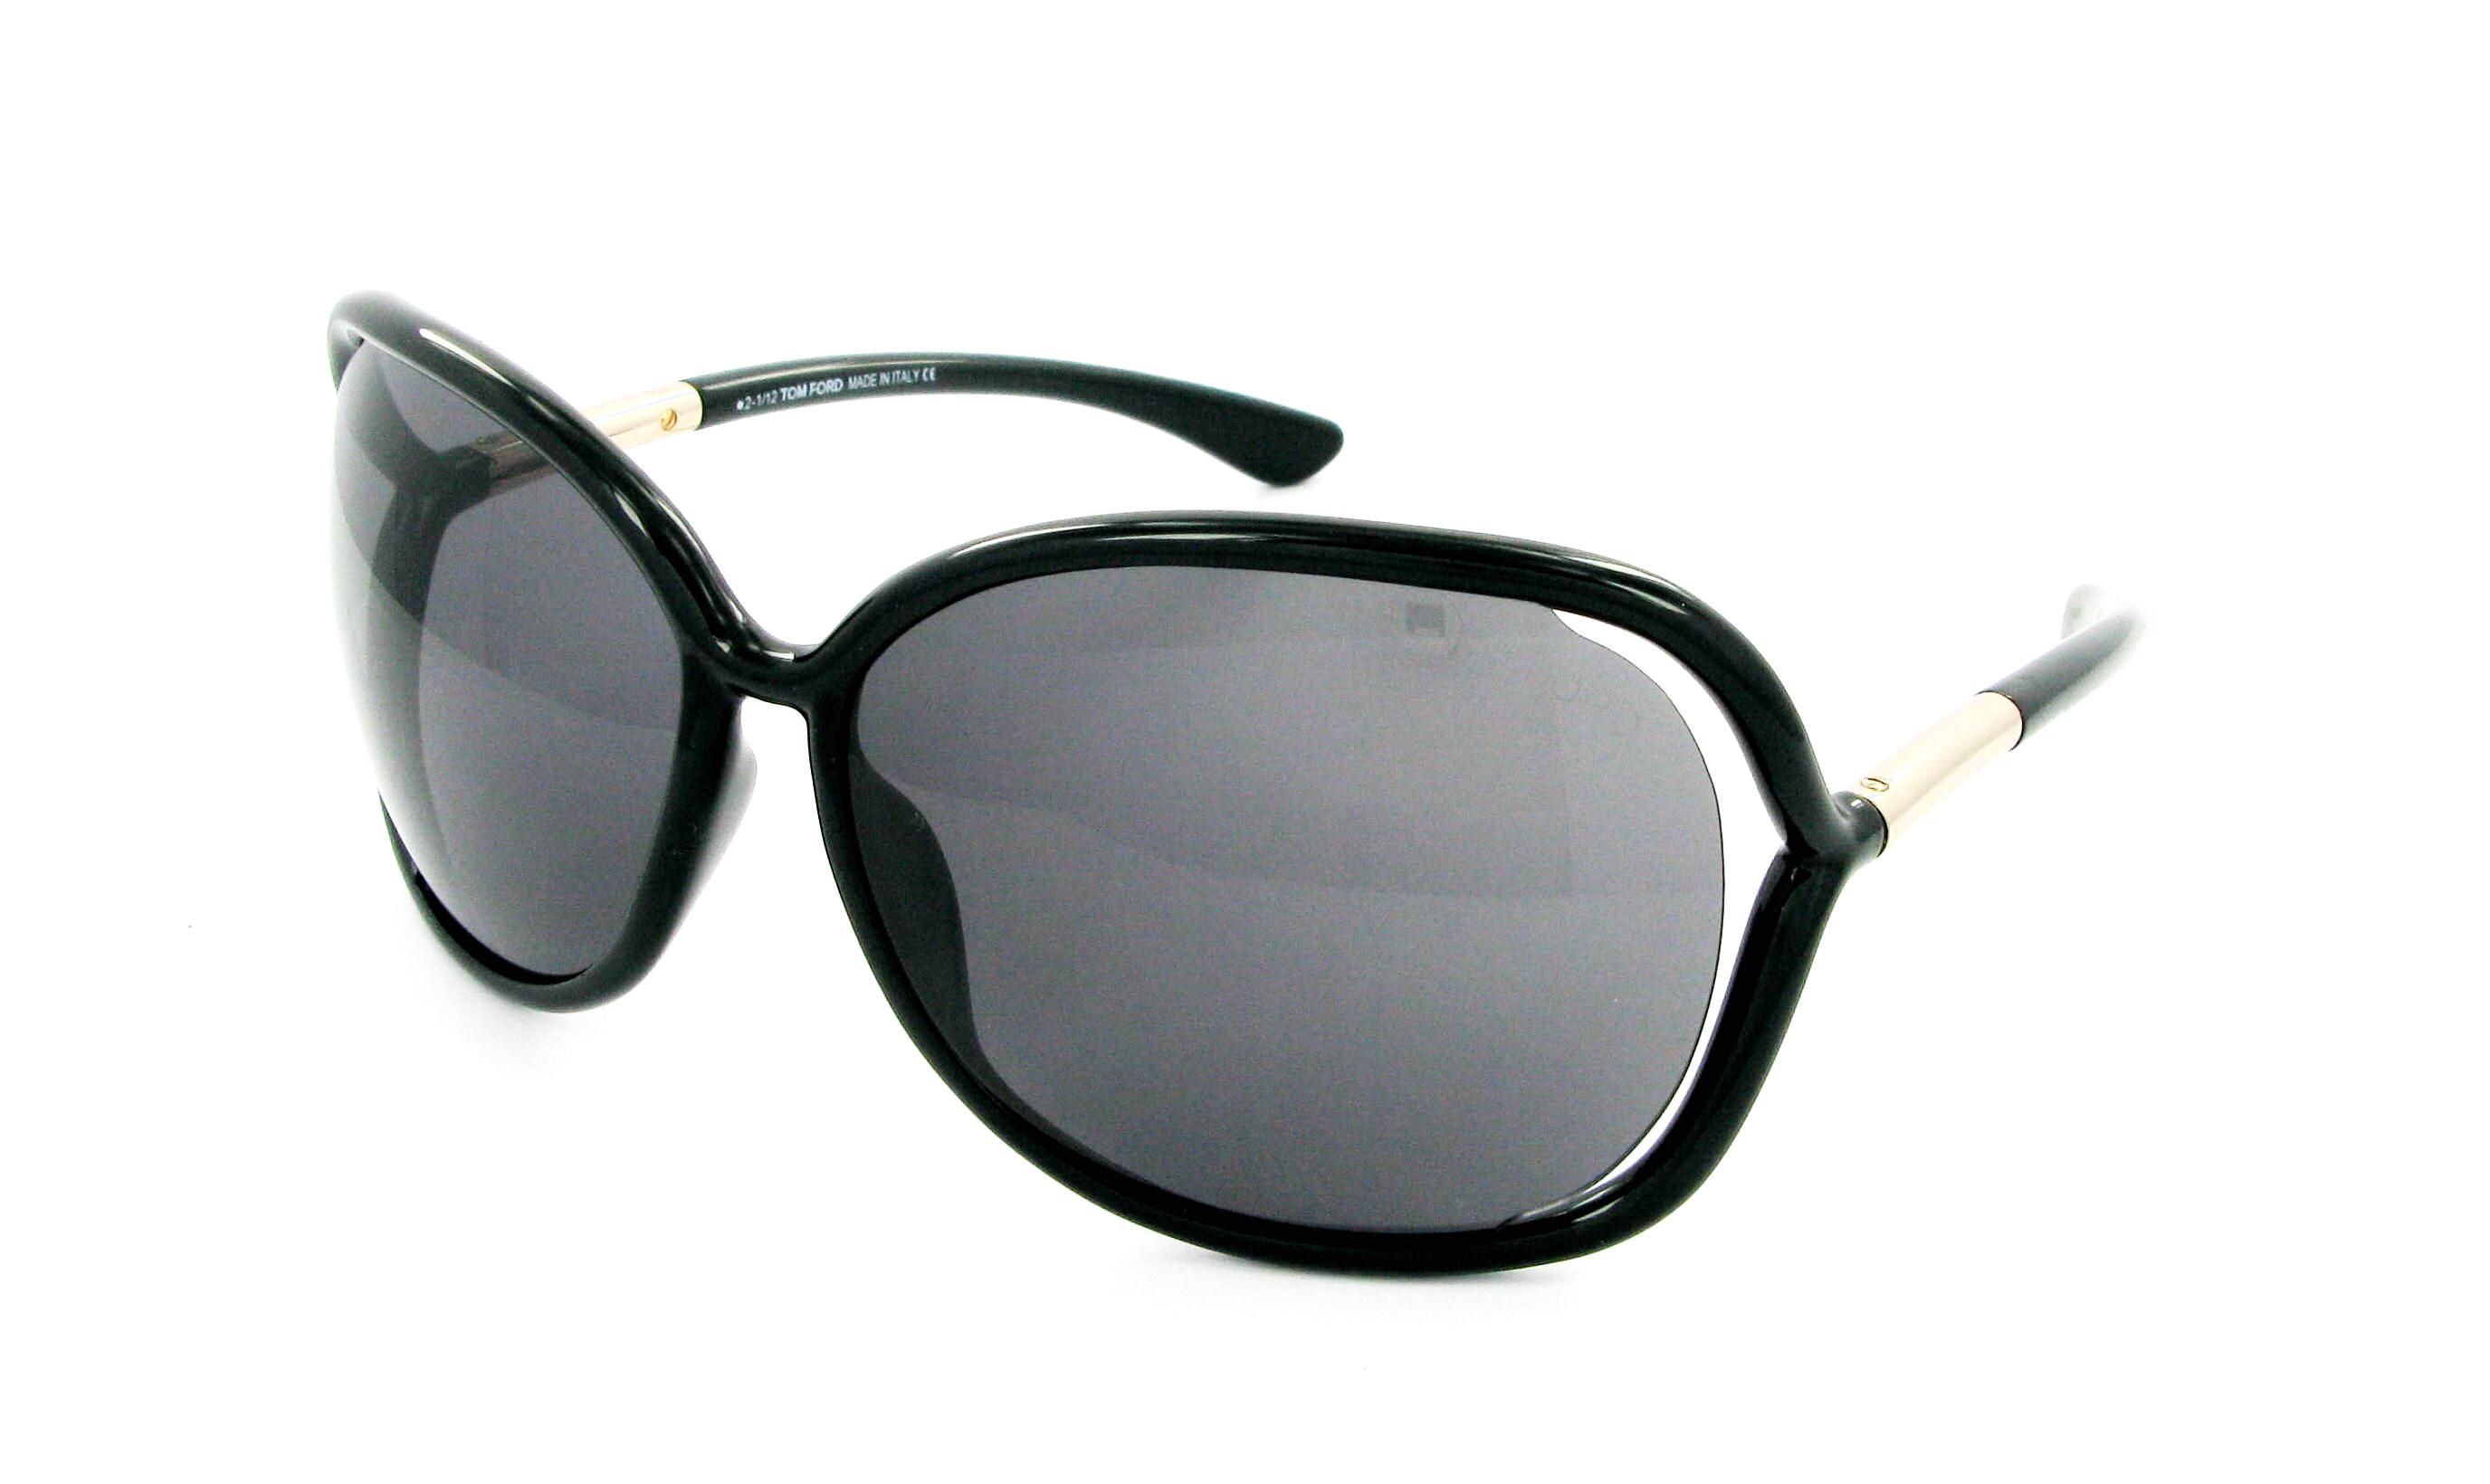 lunettes de soleil tom ford ft 0076 0b5 63 14 femme noire ovale cercl e fashion 63mmx14mm 276. Black Bedroom Furniture Sets. Home Design Ideas